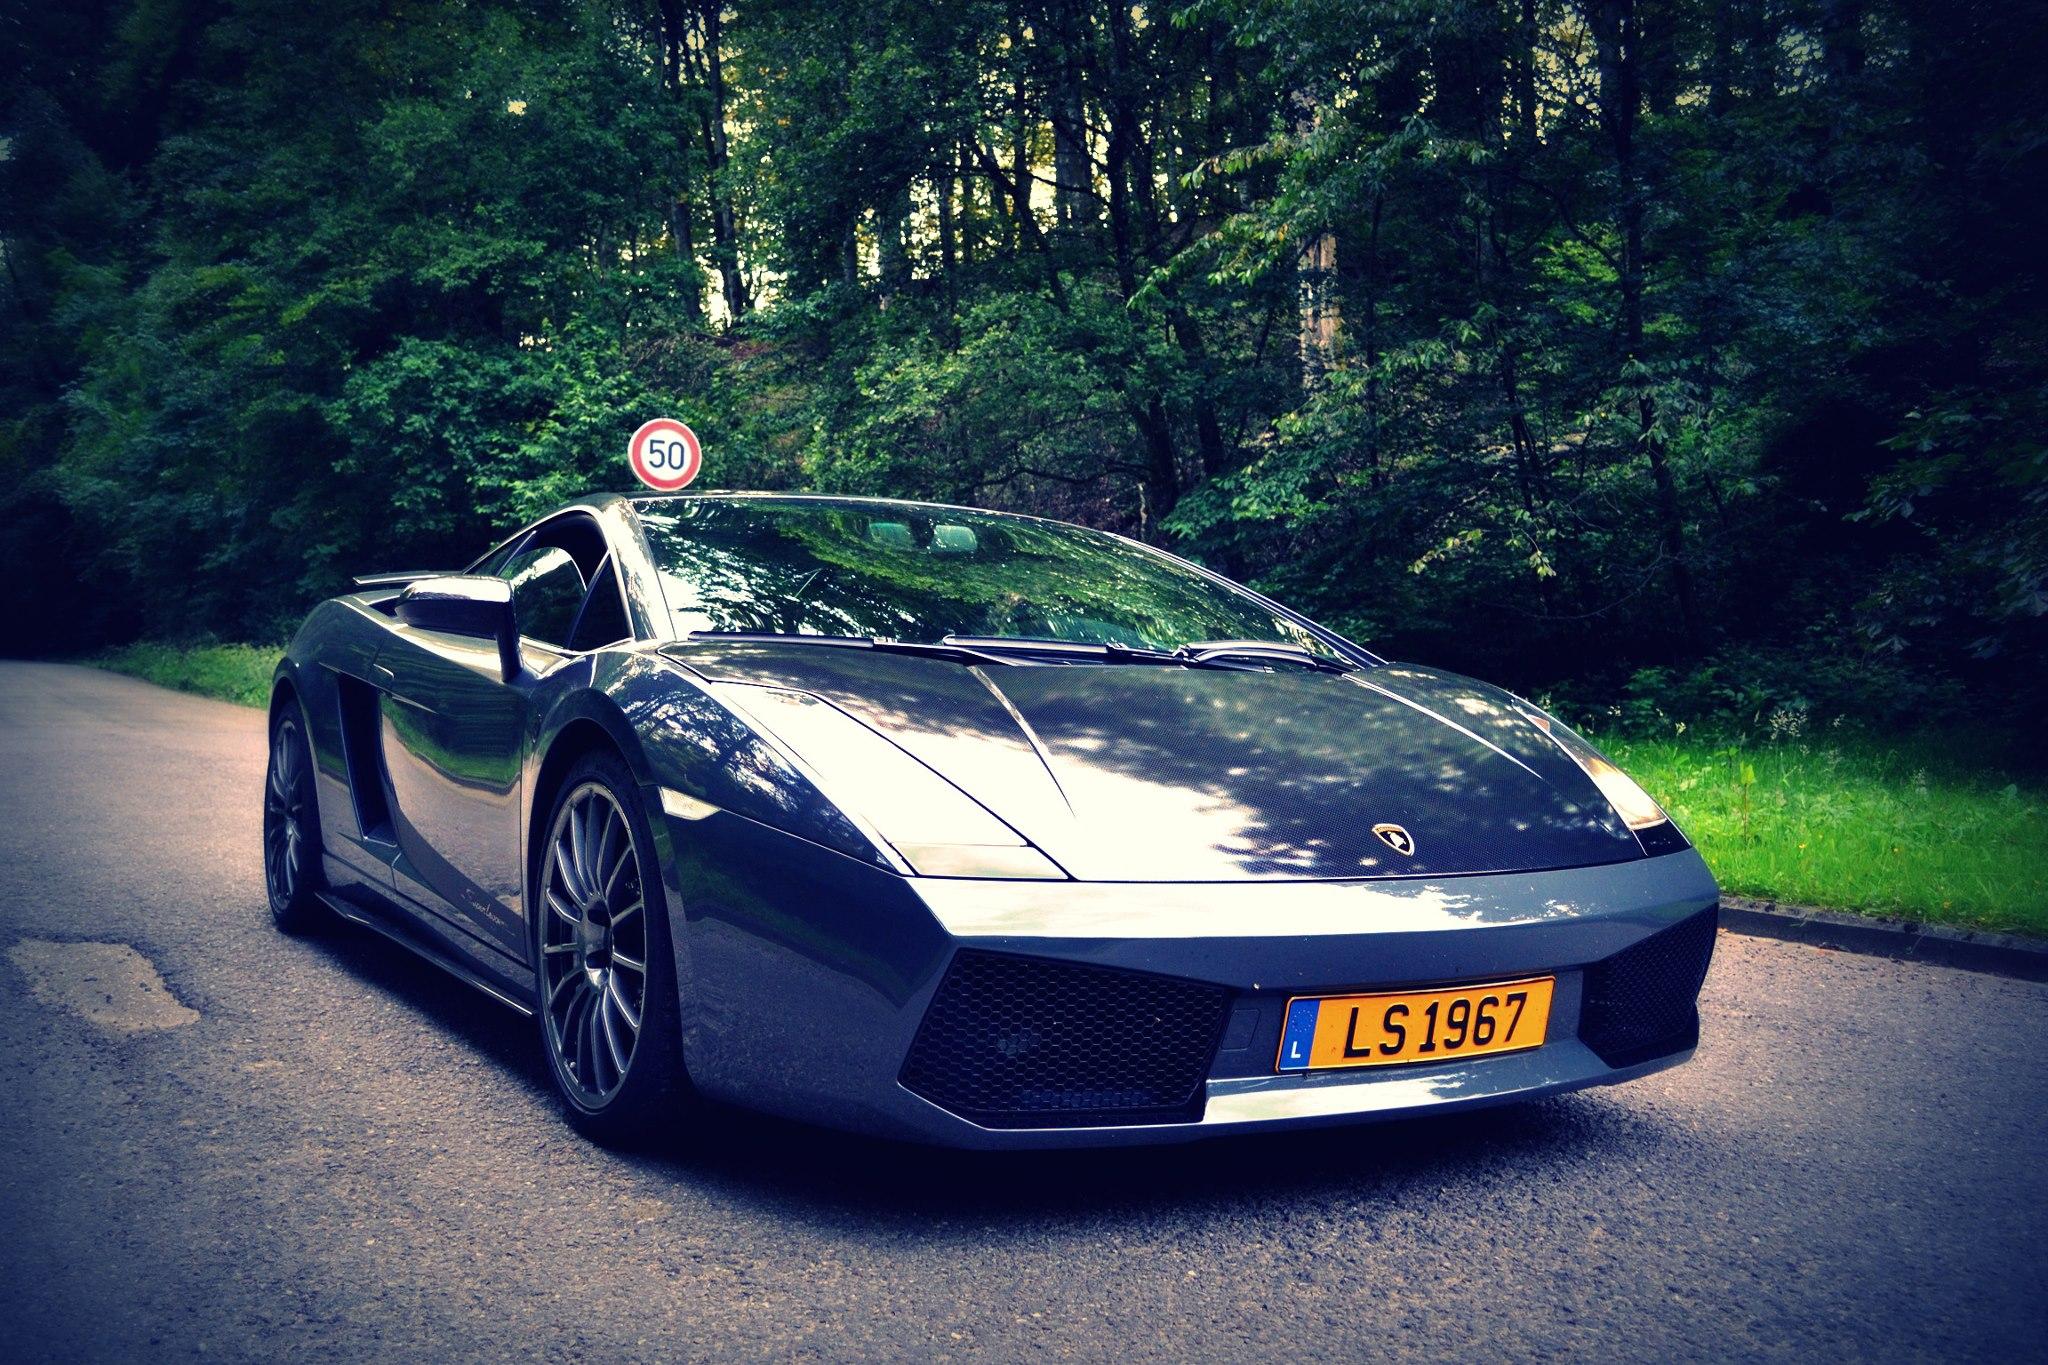 Lamborghini Gallardo Superleggera - www.hartvoorautos.nl